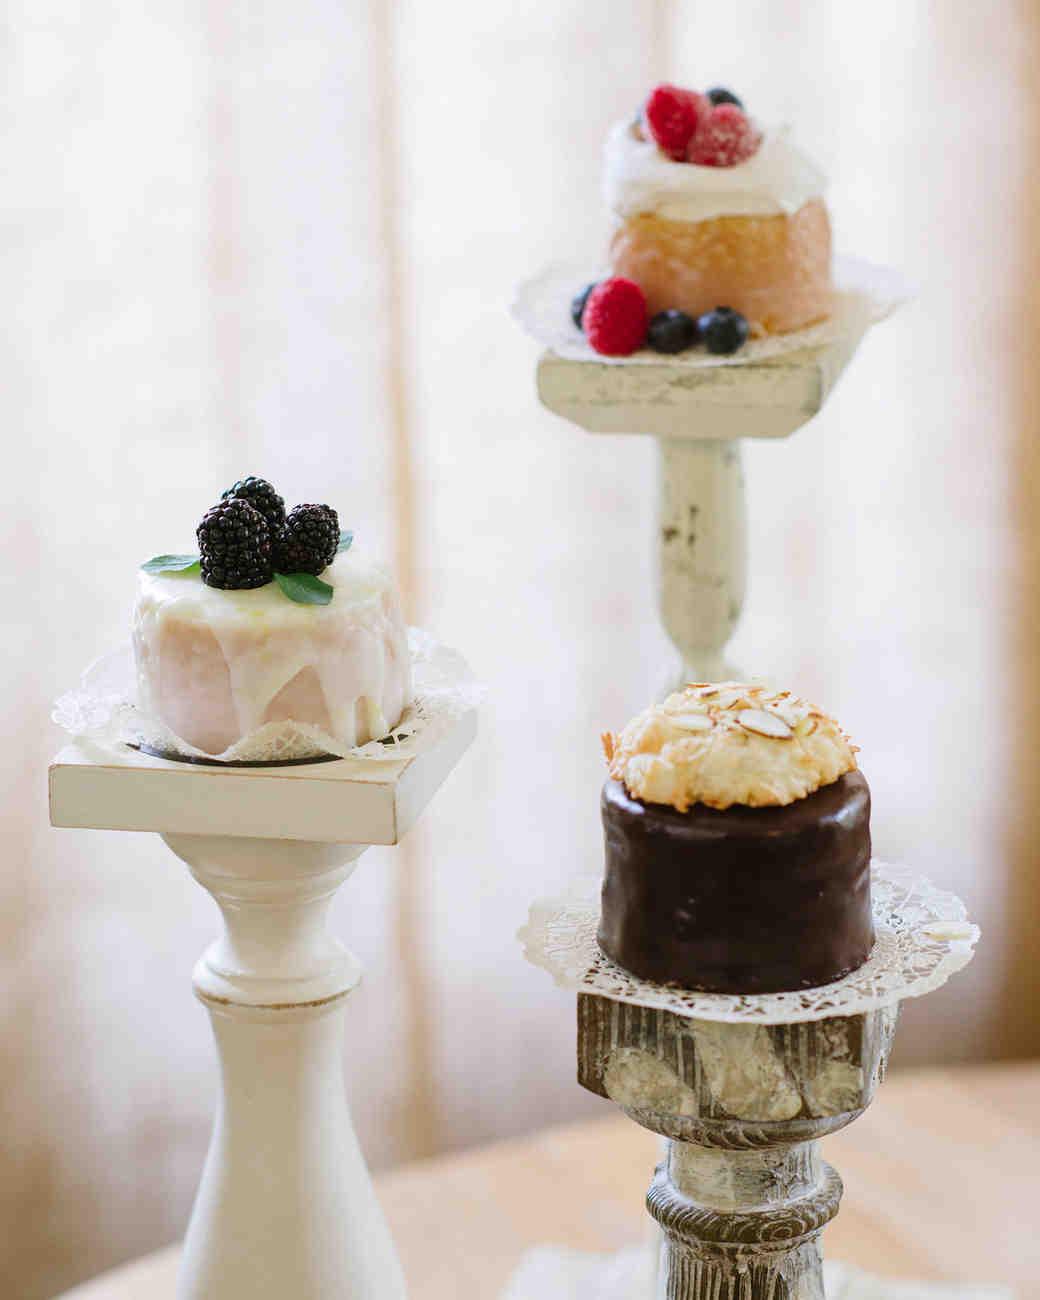 learn-the-lingo-frosting-glaze-favorite-cakes-0814.jpg